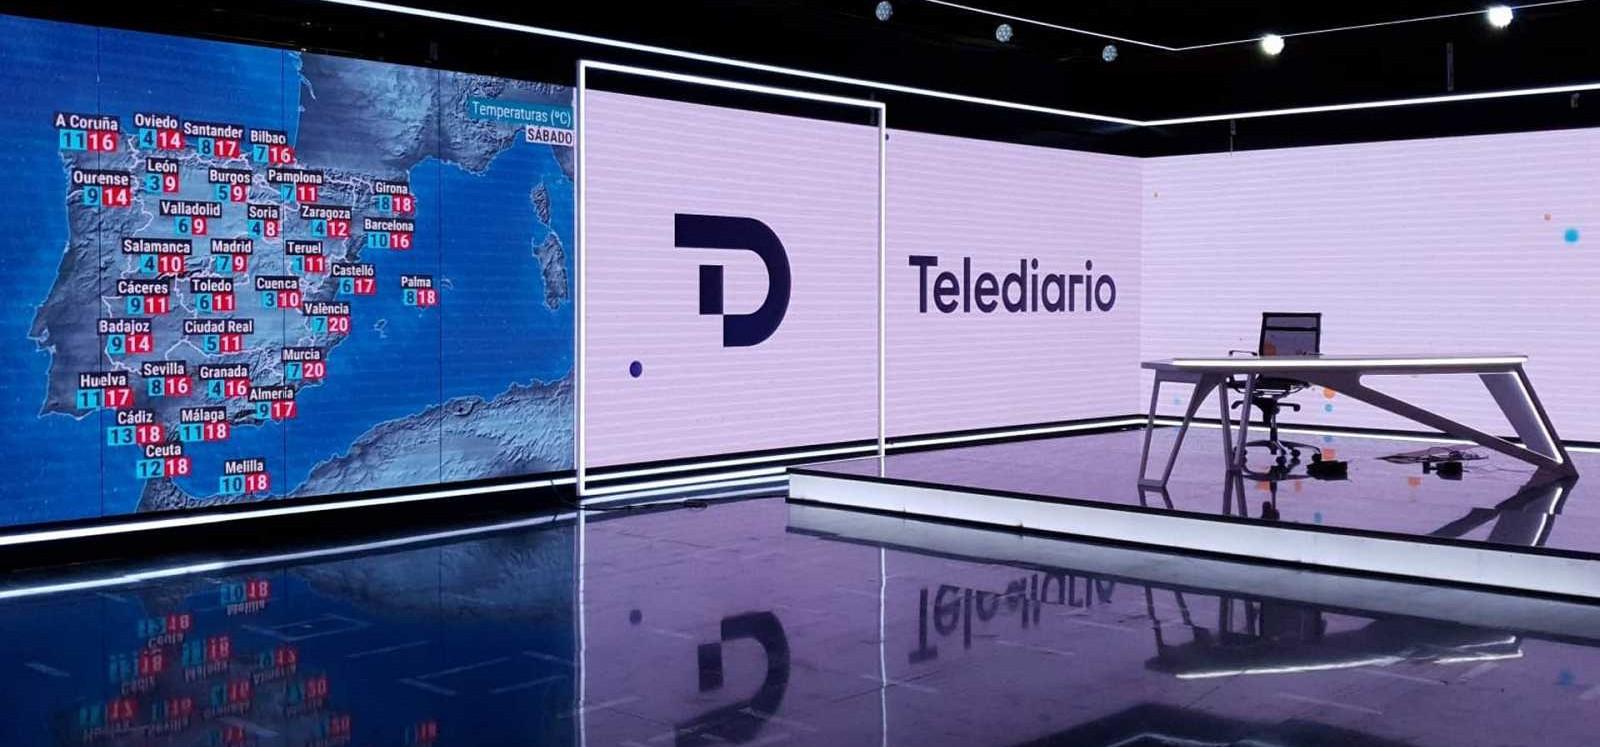 cambio-imagen-telediarios